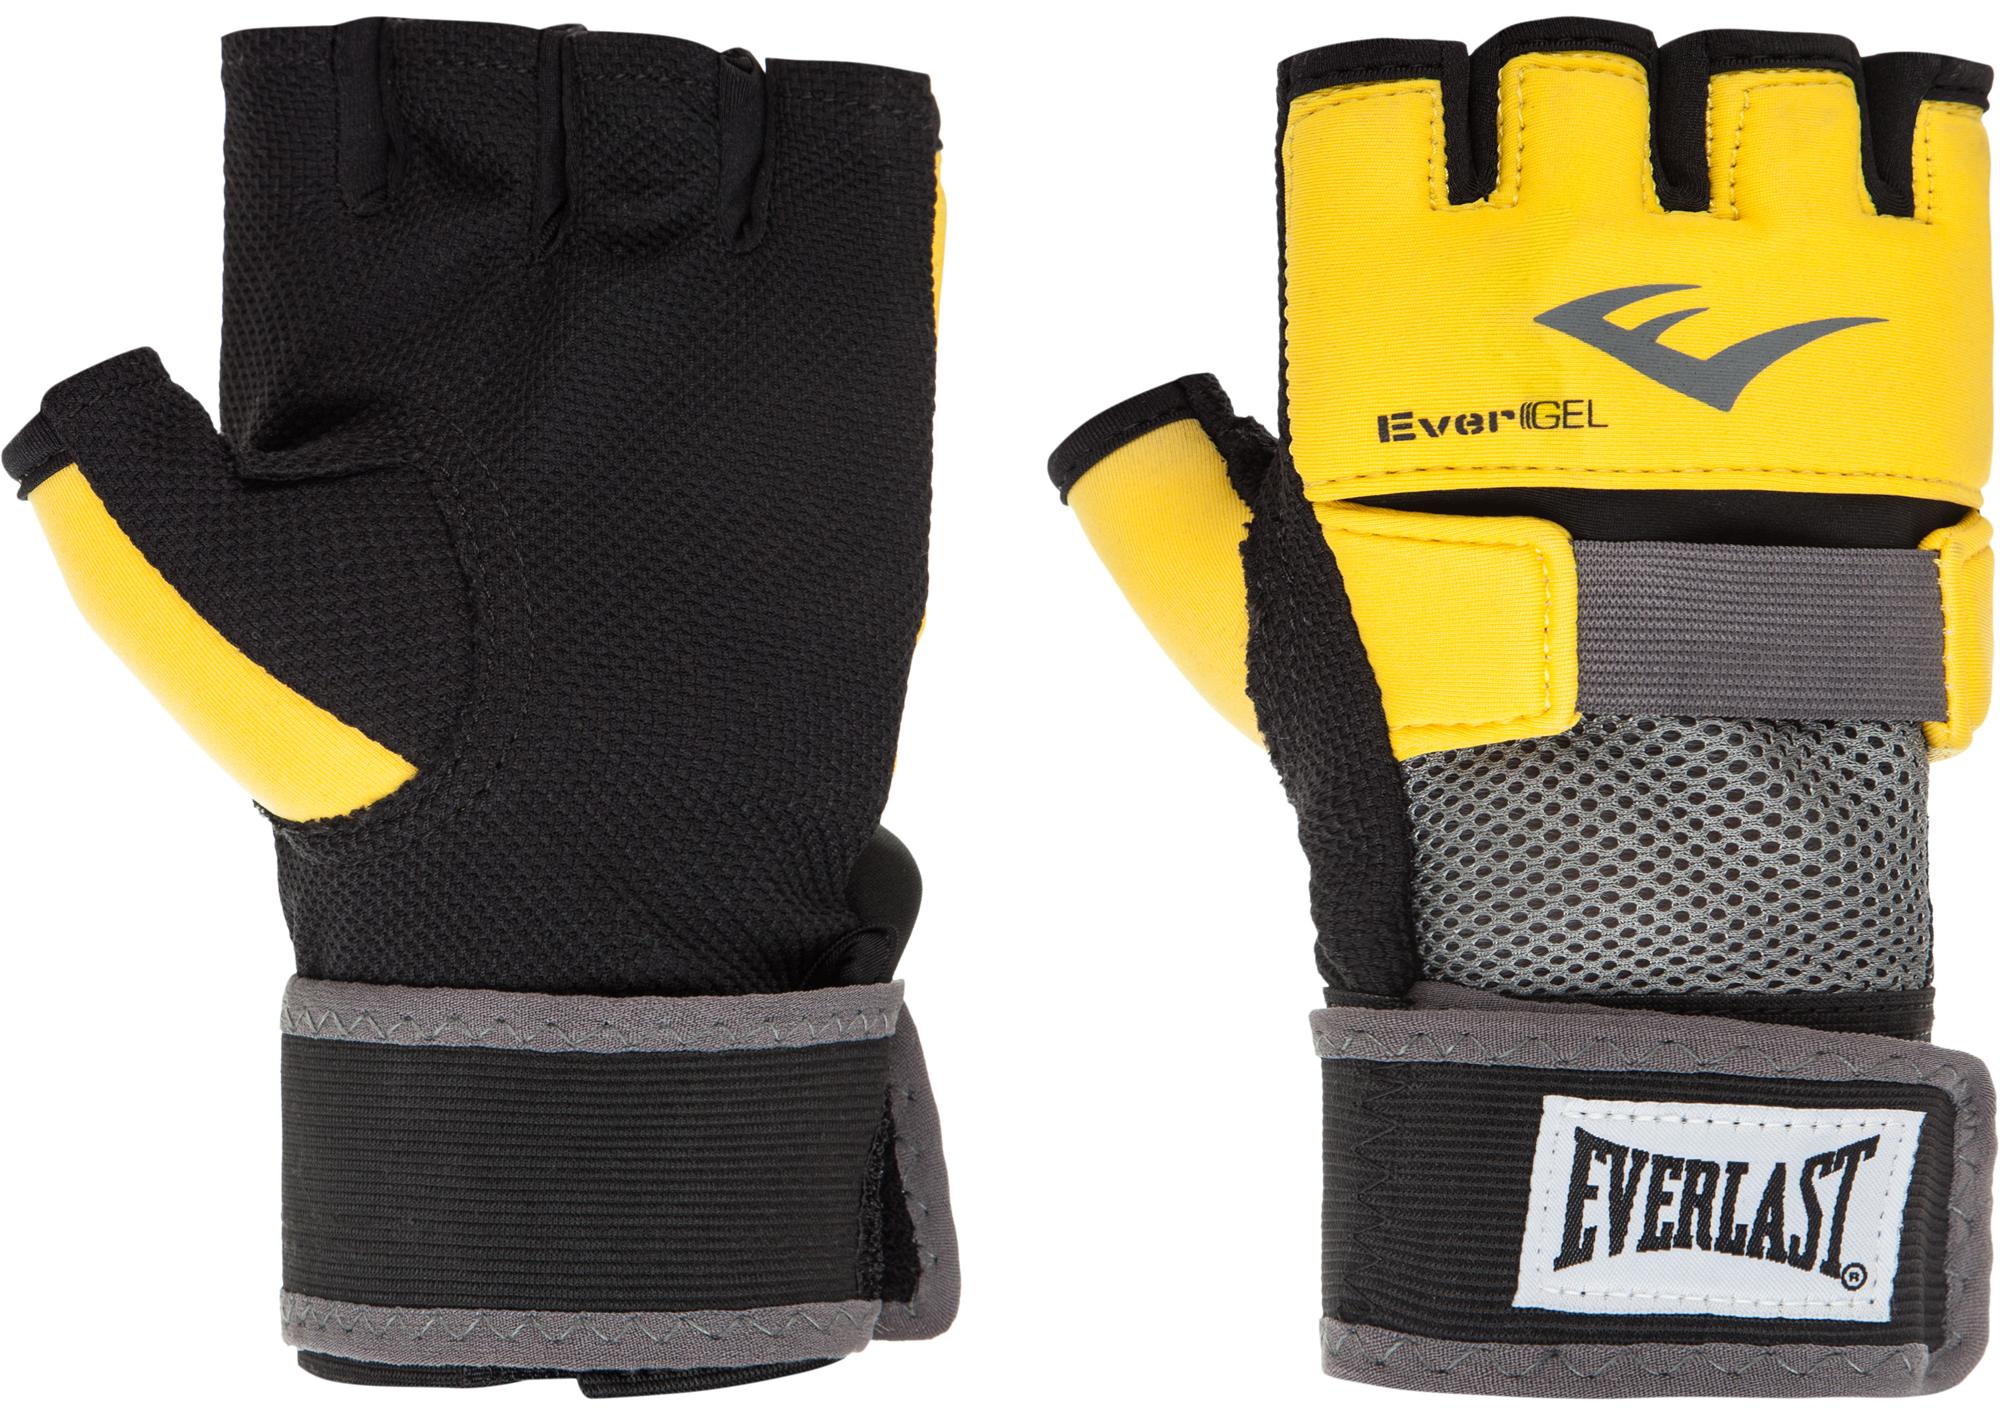 перчатки гелевые с бинтом everlast duster evergel цвет желтый длина бинта 150 см размер s m Everlast Перчатки-бинты снарядные Everlast Evergel, размер 11